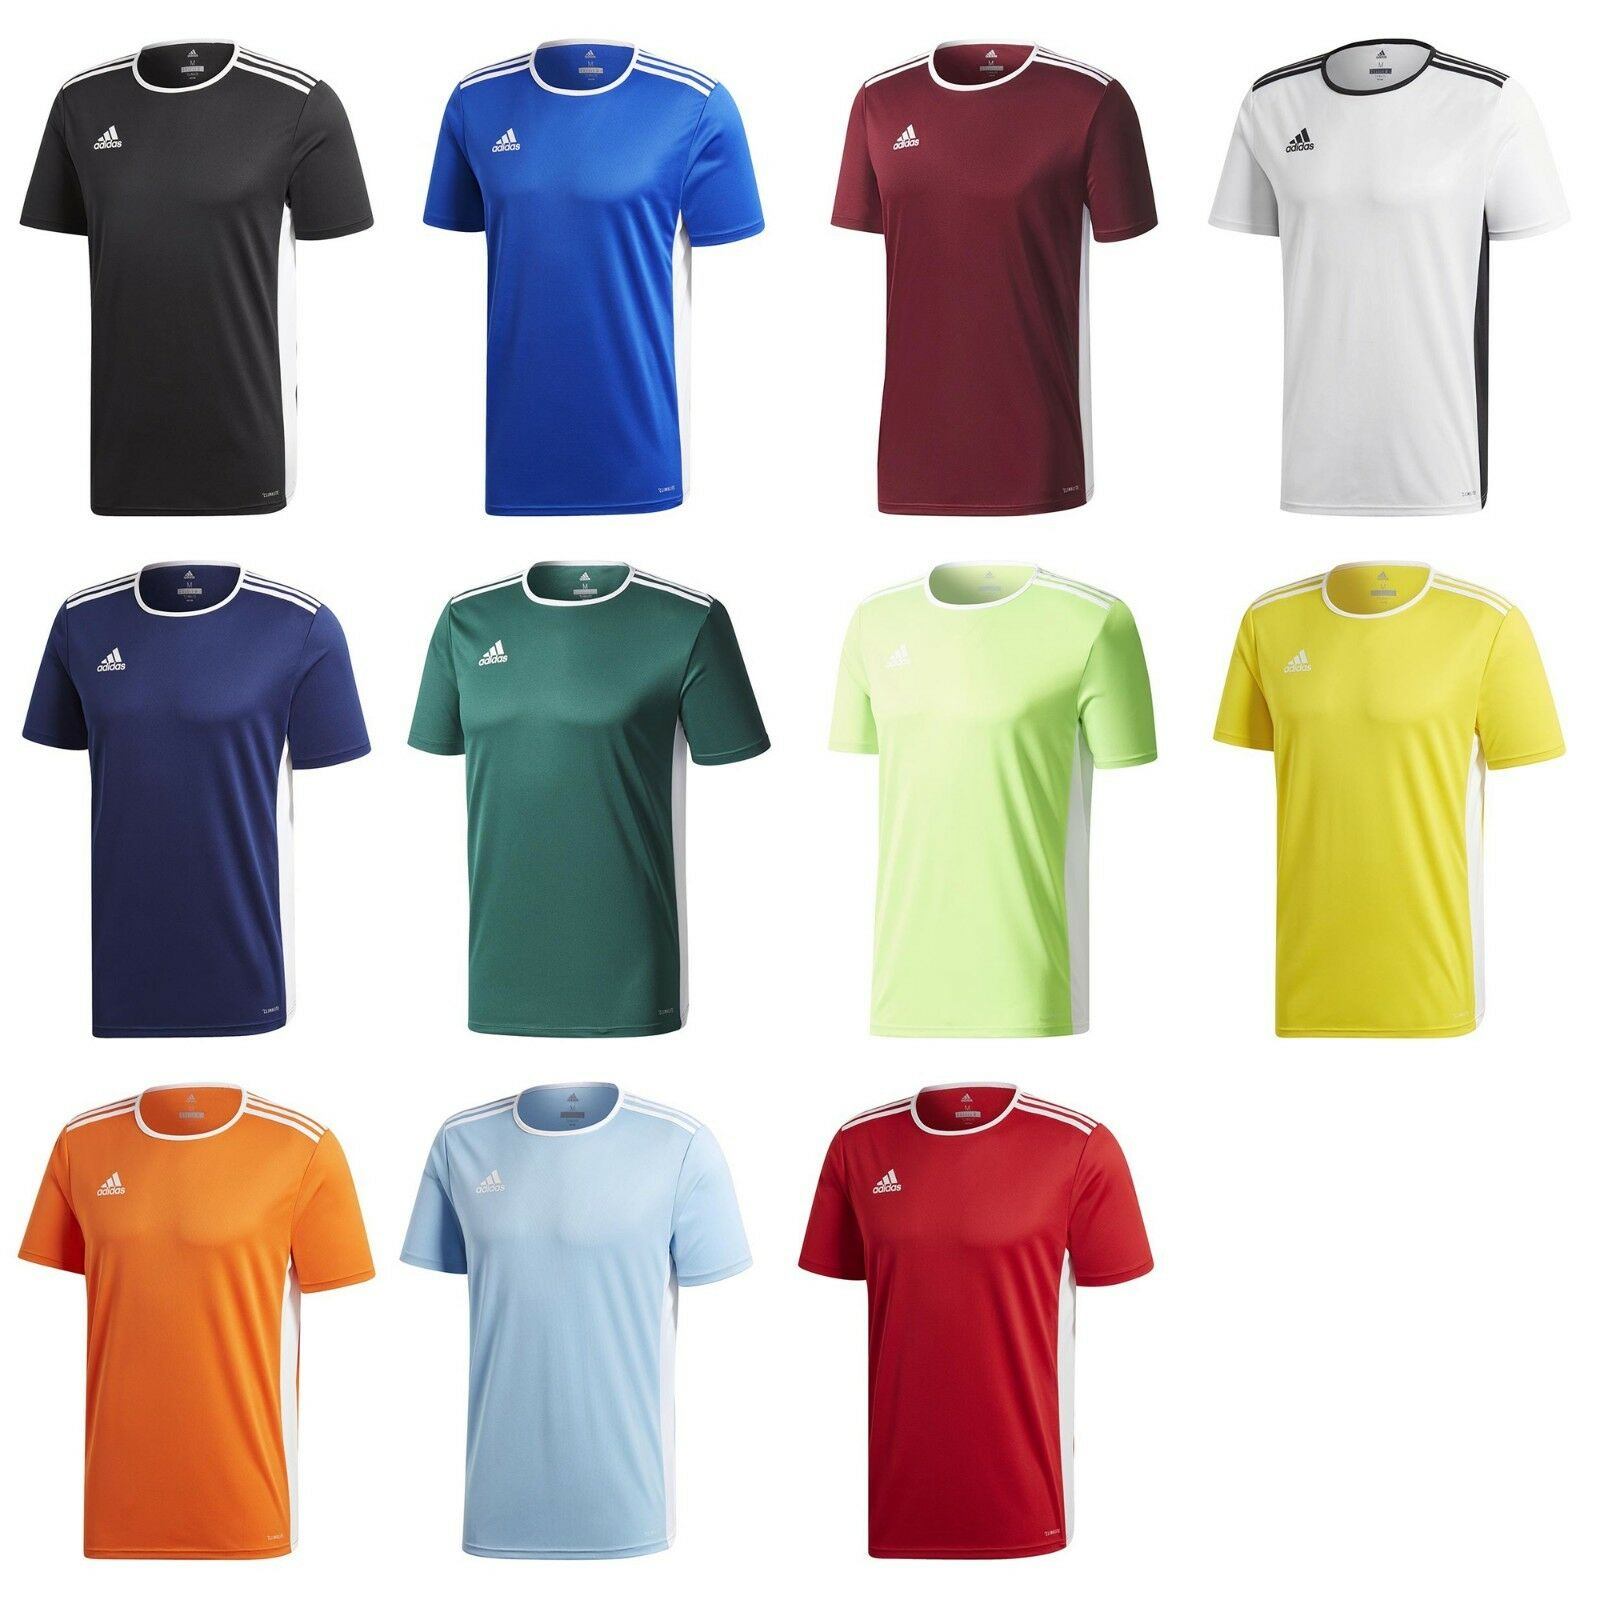 Maillot Adidas T shirt Entrada 18 Tee 036 XL   Achetez sur eBay